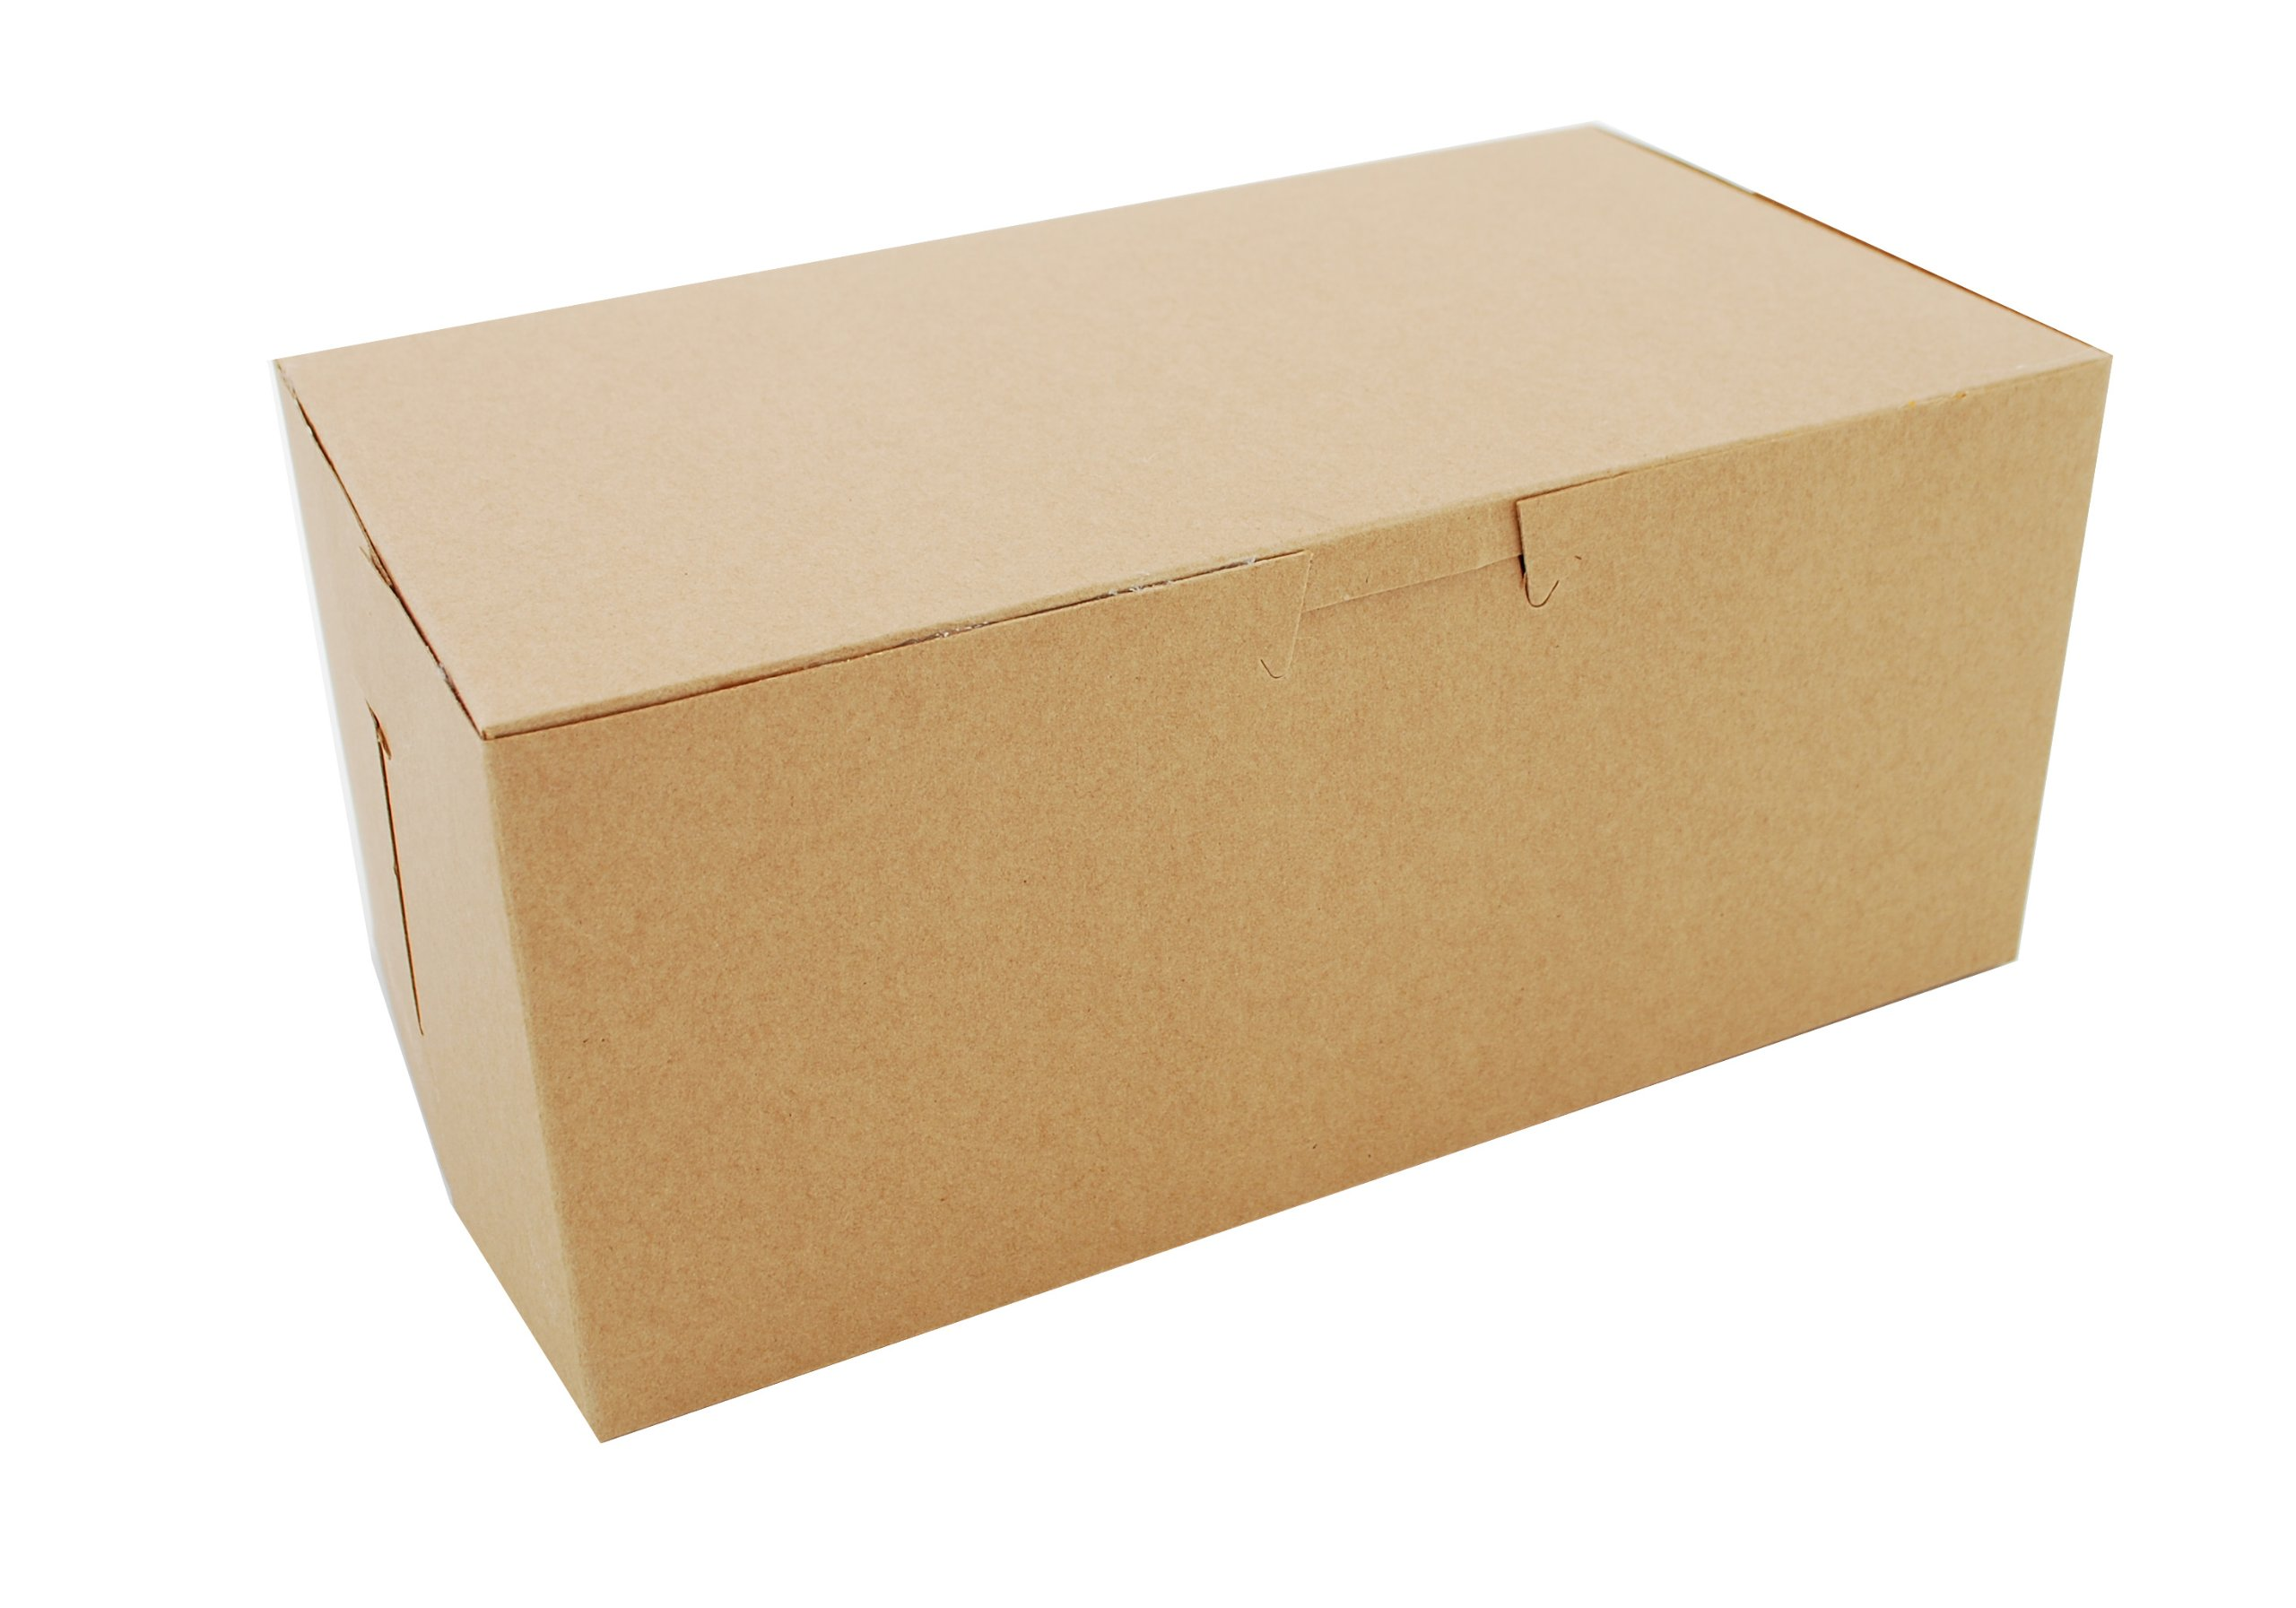 Southern Champion Tray 0949K Kraft Paperboard Non Window Lock Corner Bakery Box, 9'' Length x 5'' Width x 4'' Height (Case of 250)